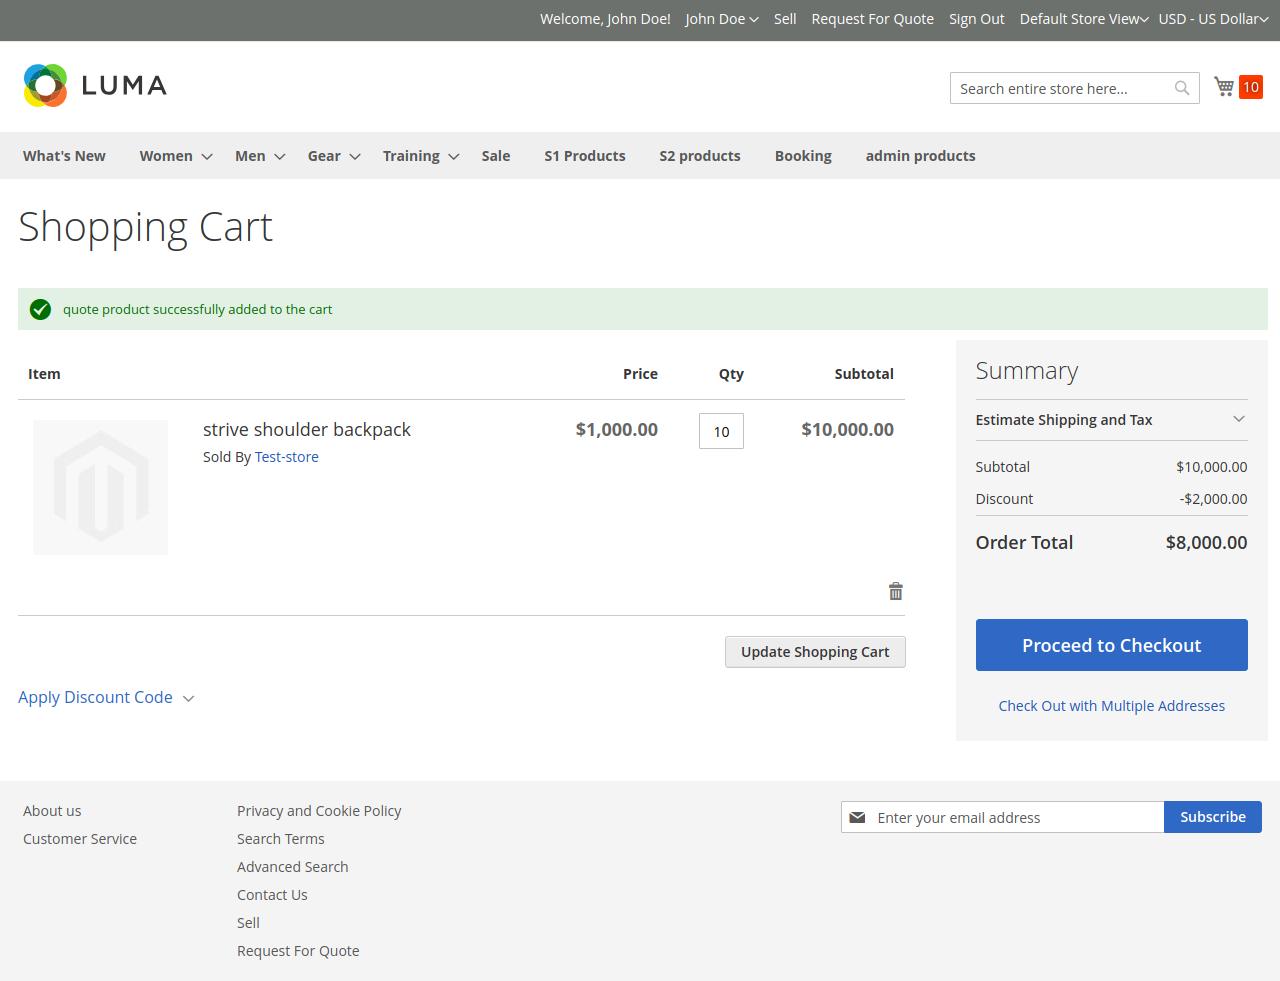 webkul-magento2-b2b-marketplace-shopping-cart.png